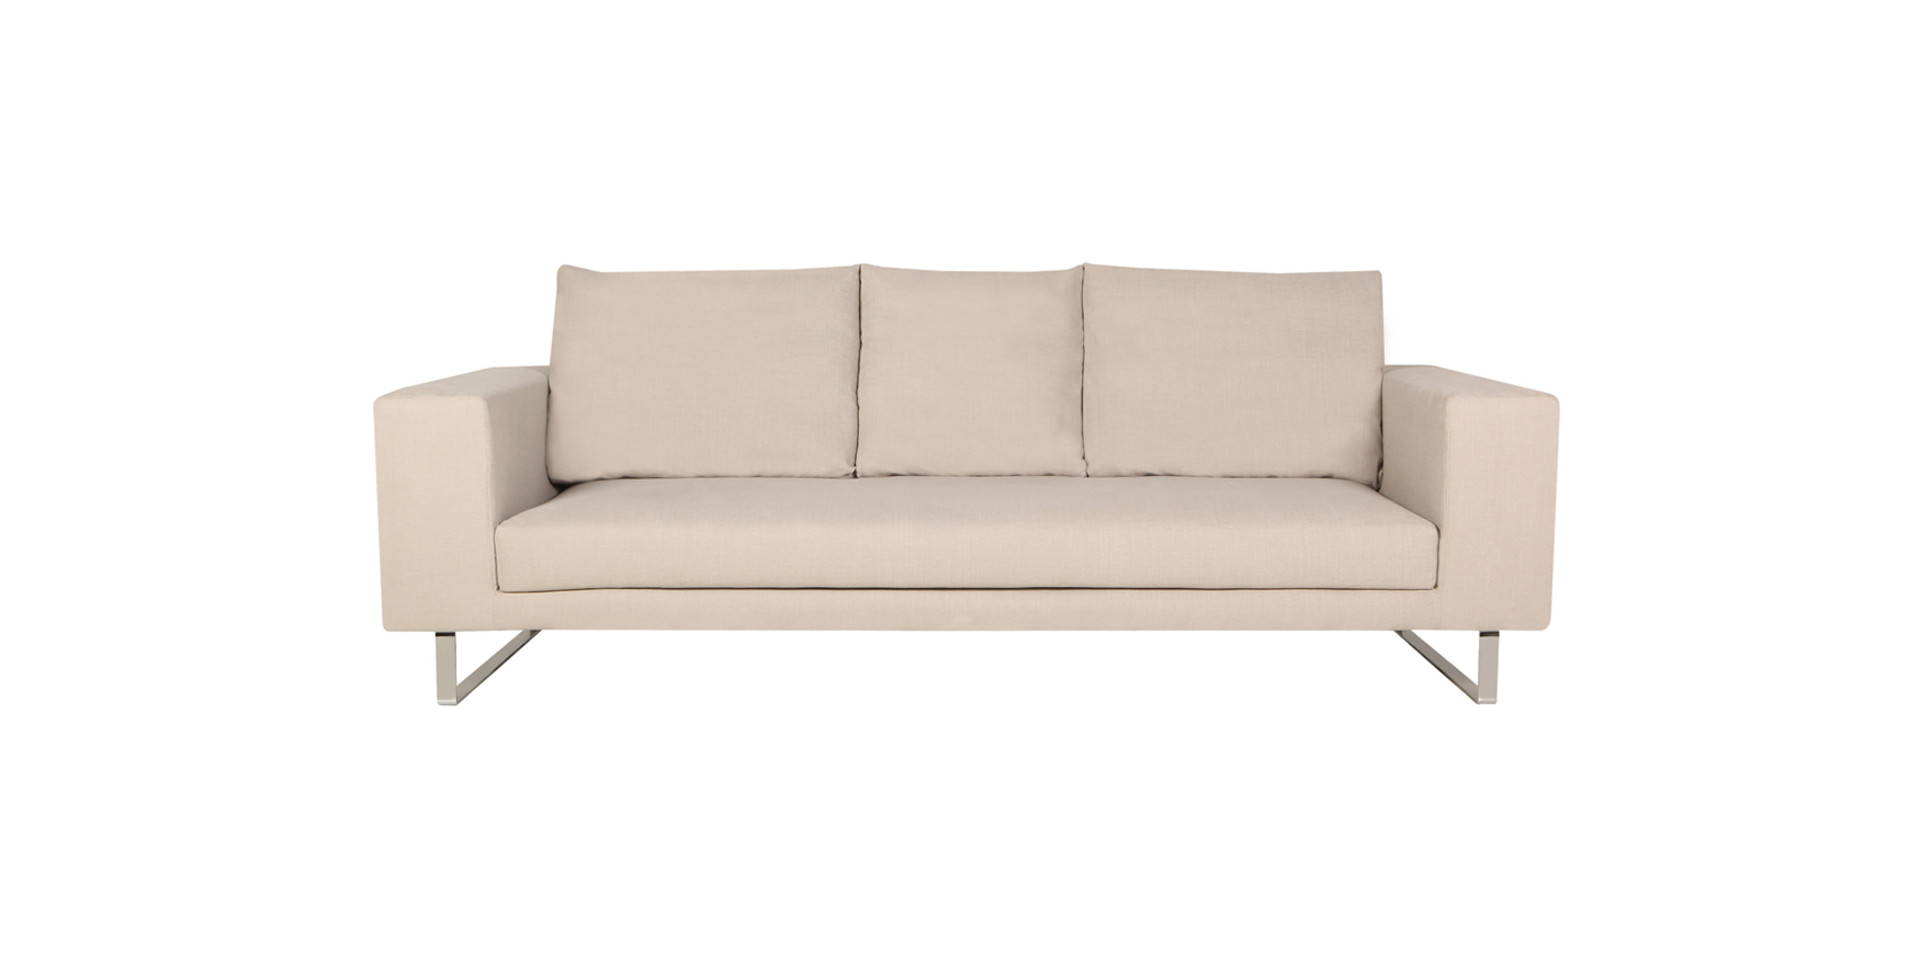 sits-linnea-canape-3seater_caleido3790_light_beige_1